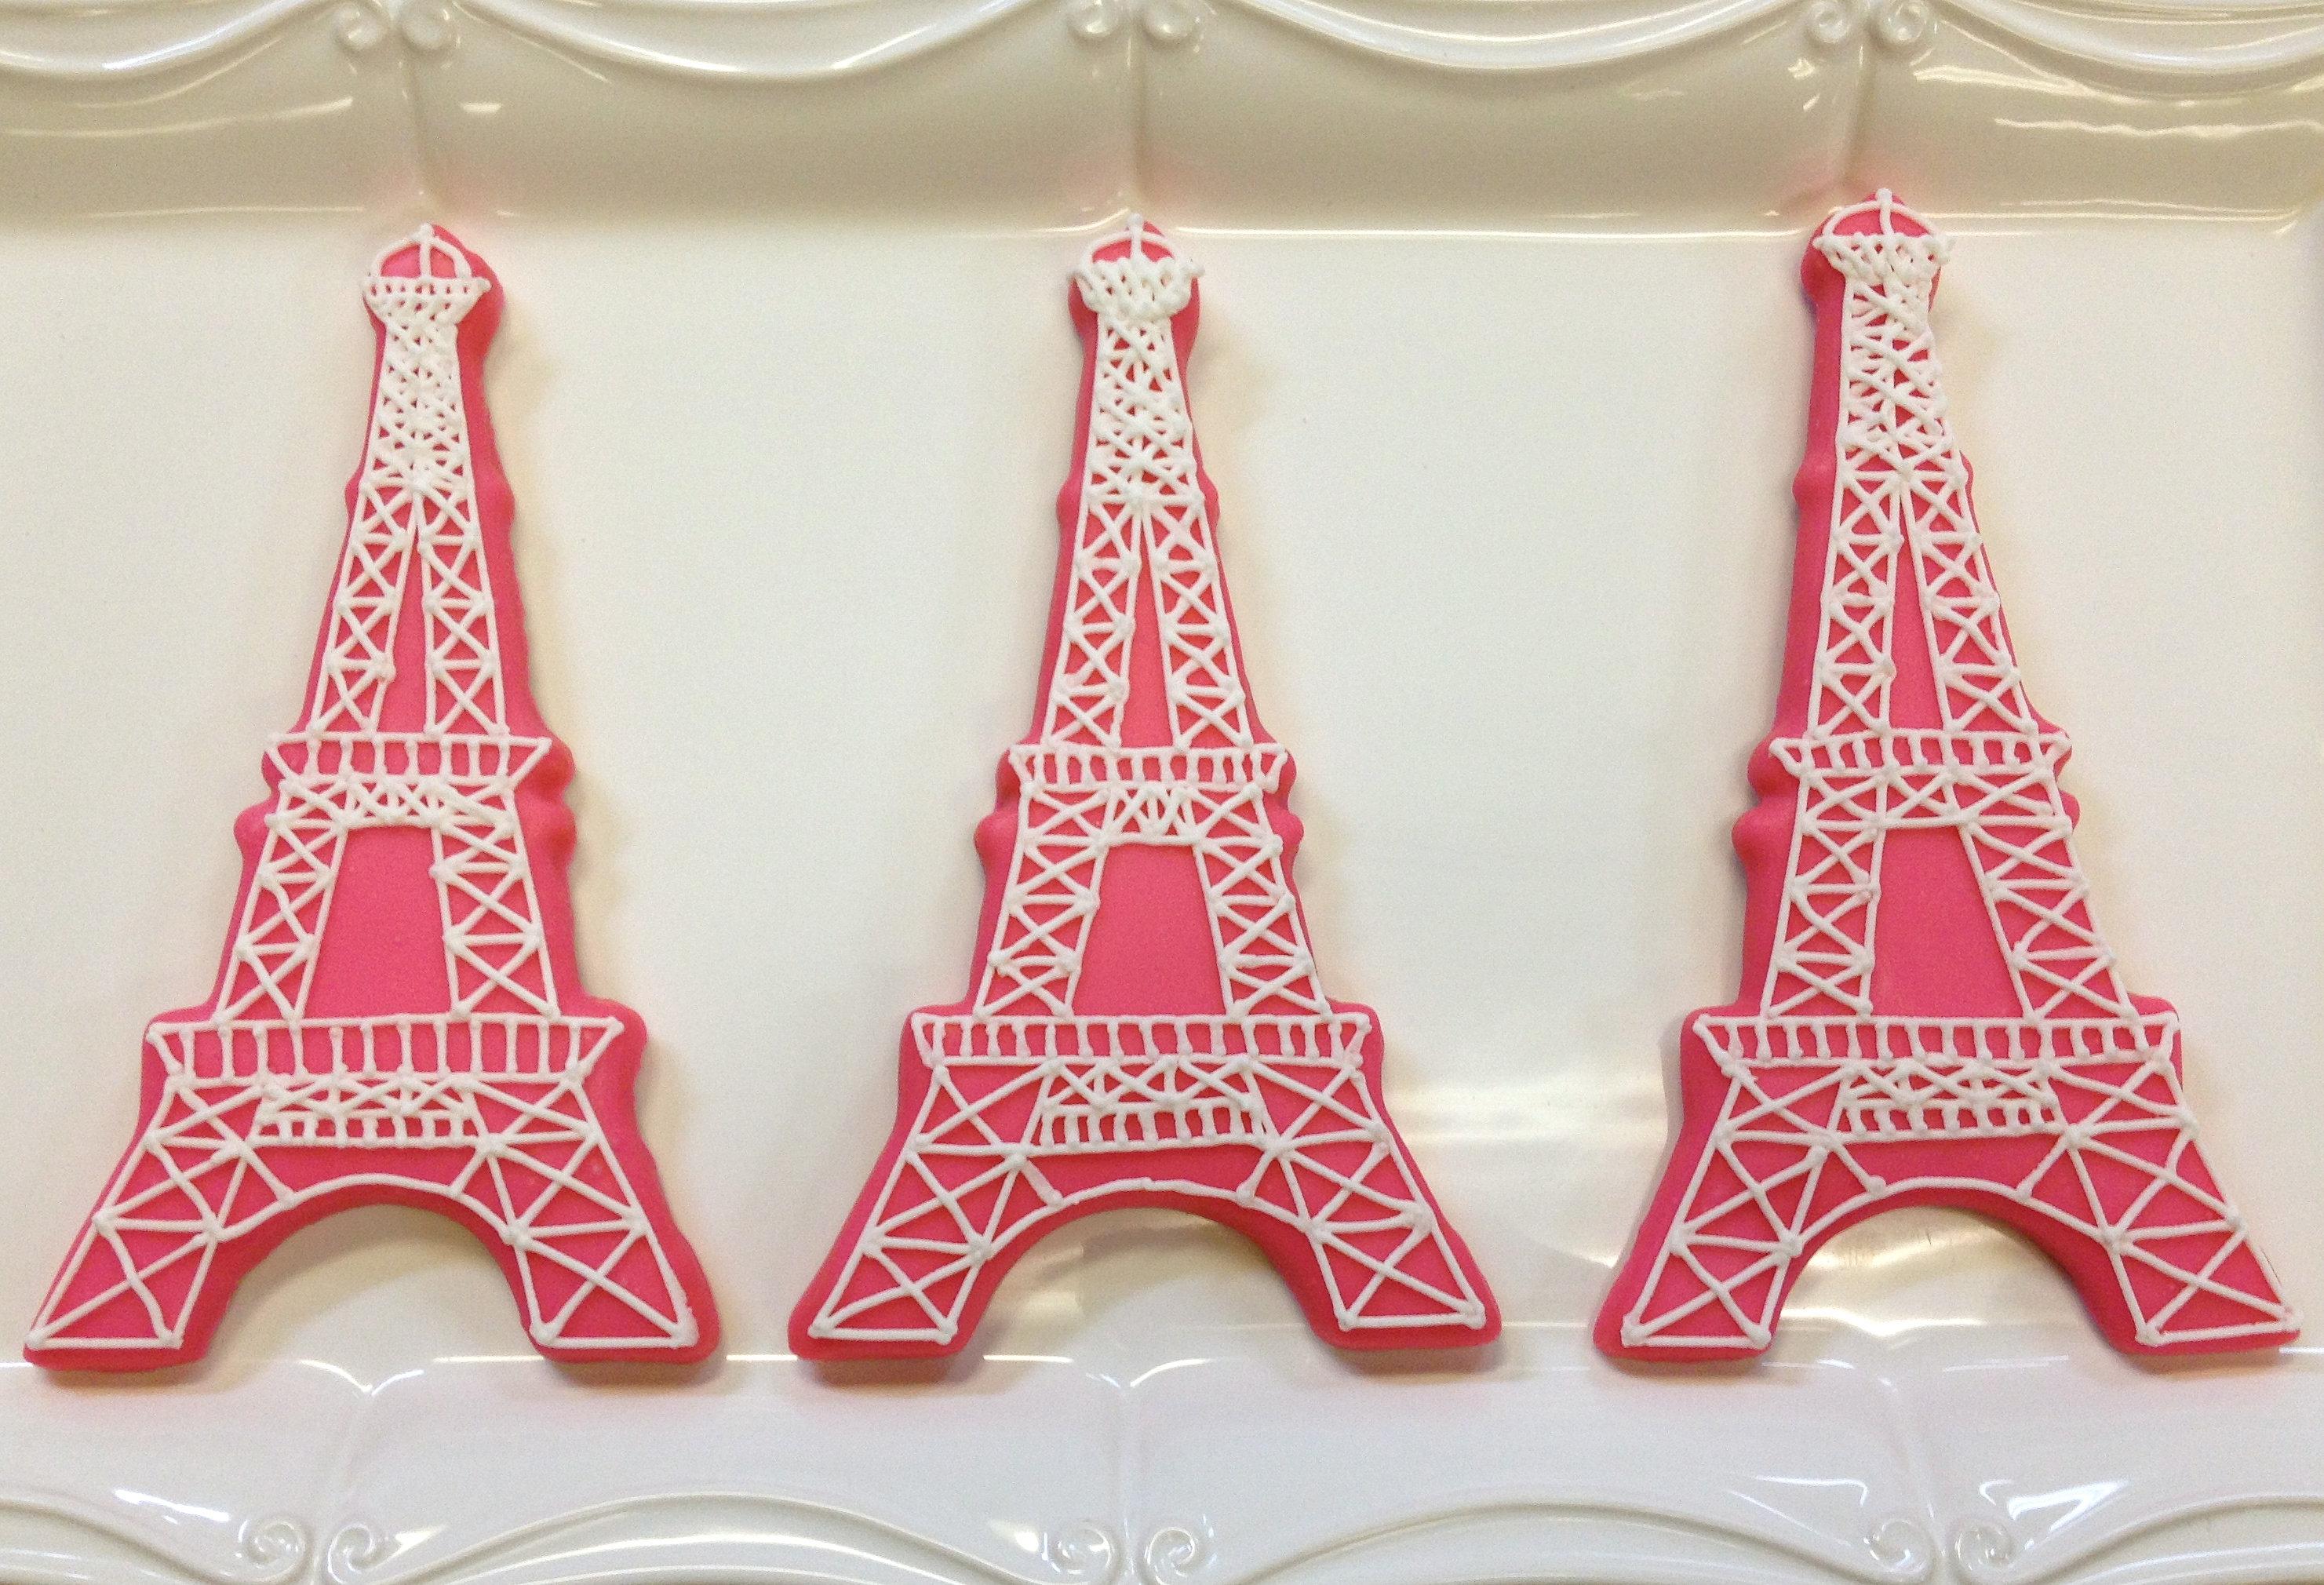 The Eiffel Tower Sarahs Cookies Eiffel Tower Shortbread Cookies